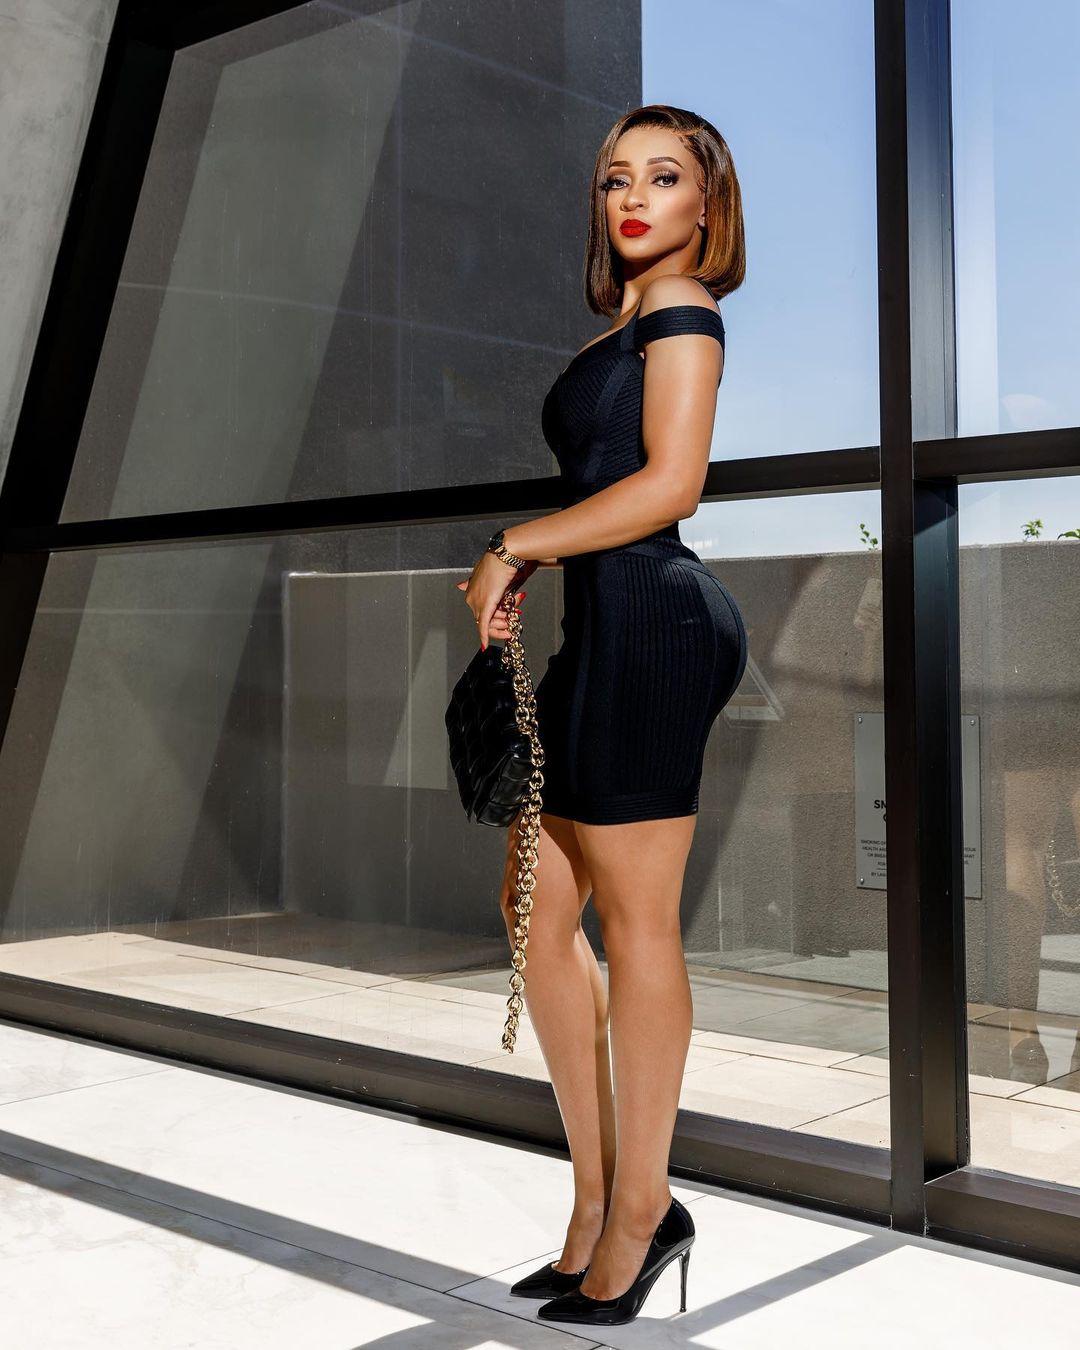 Chilla Macame: Sleek Black Party Dress